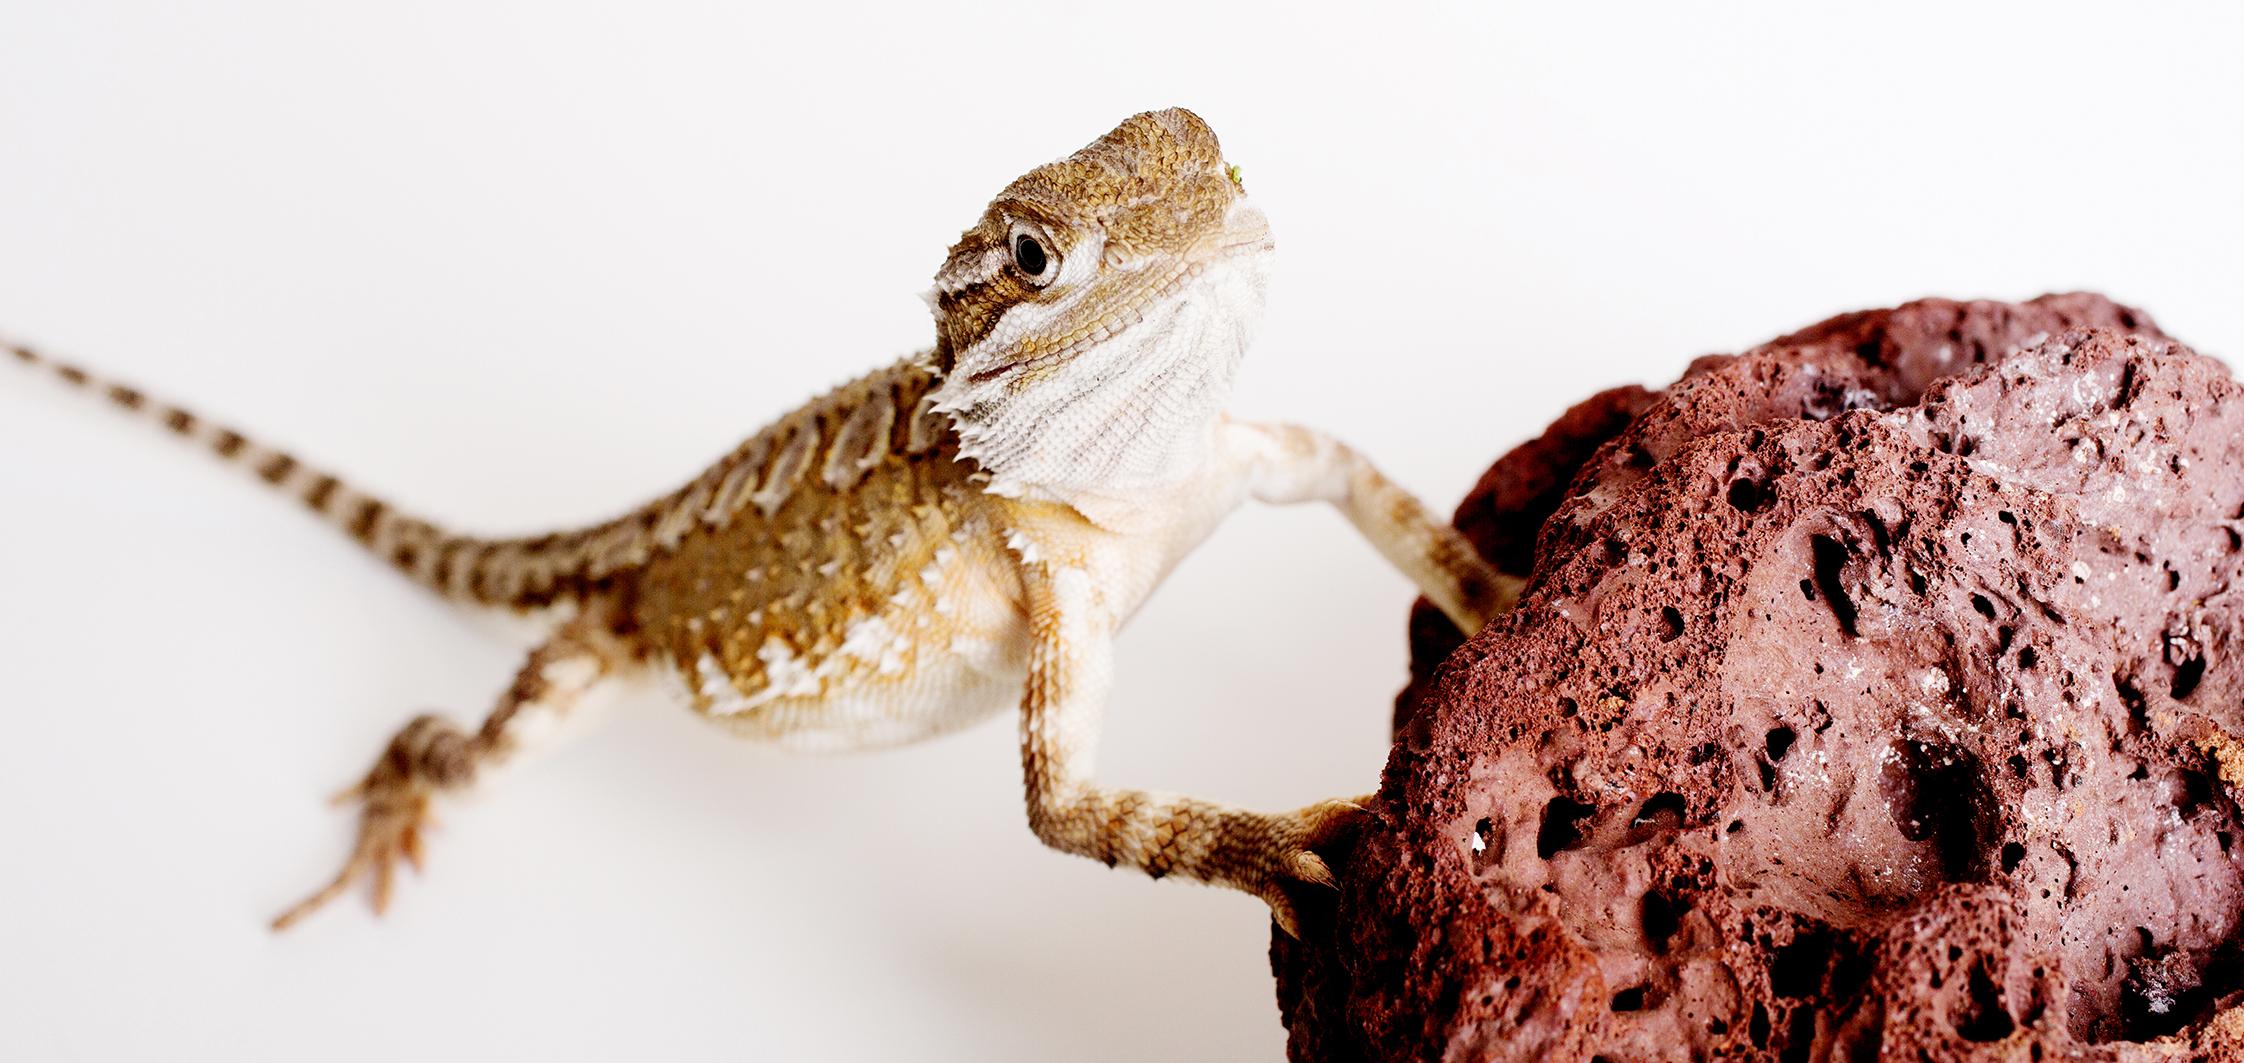 Tierfotografie, Tierfoto